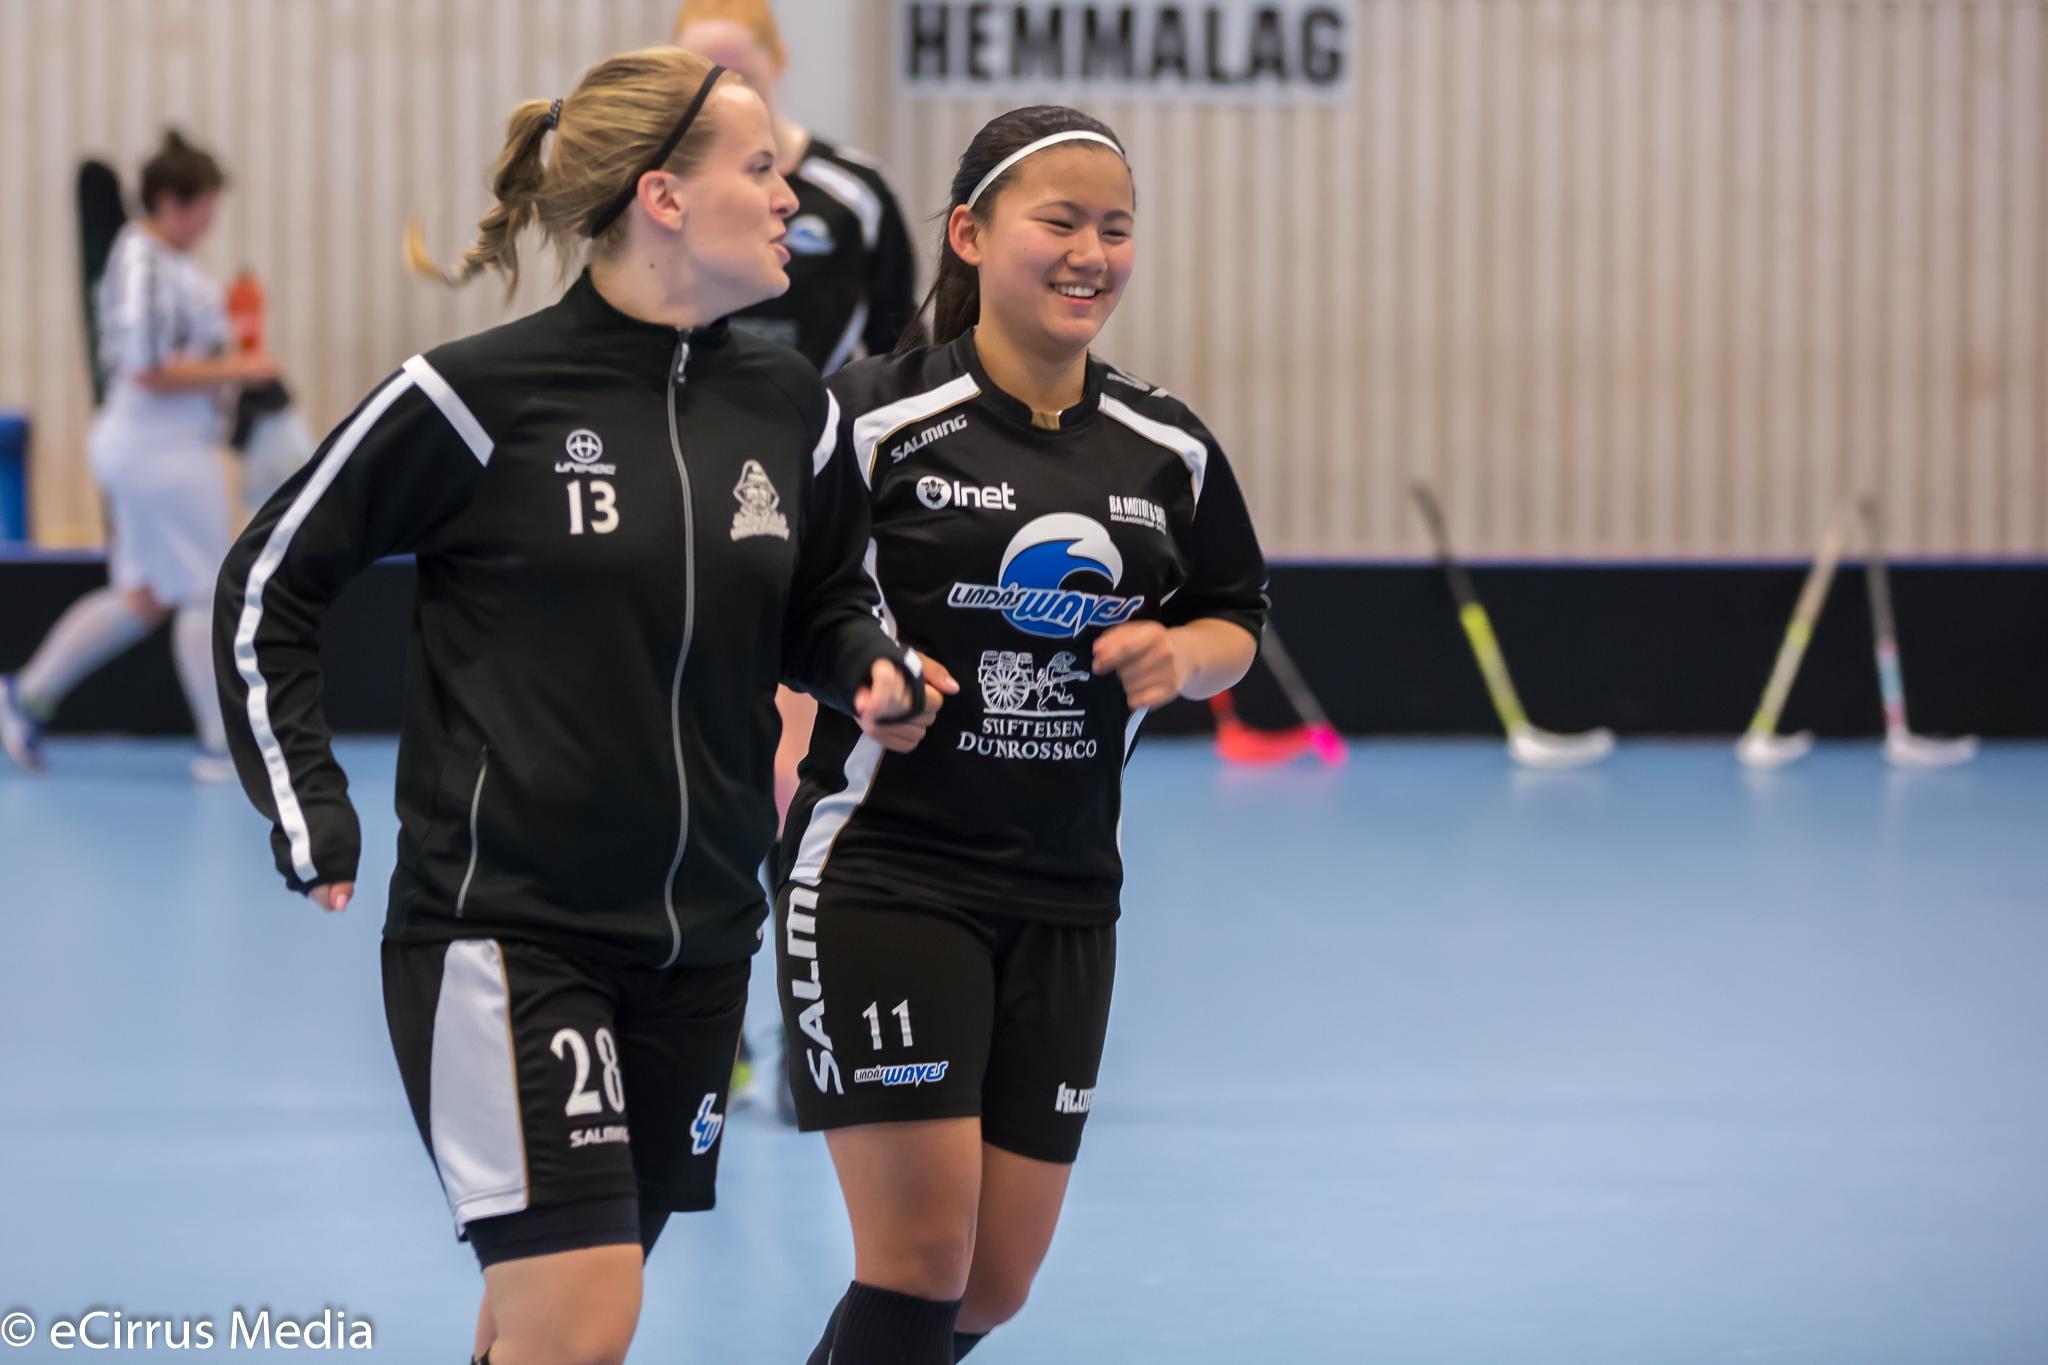 20171001D3LindåsHerrestad-8906